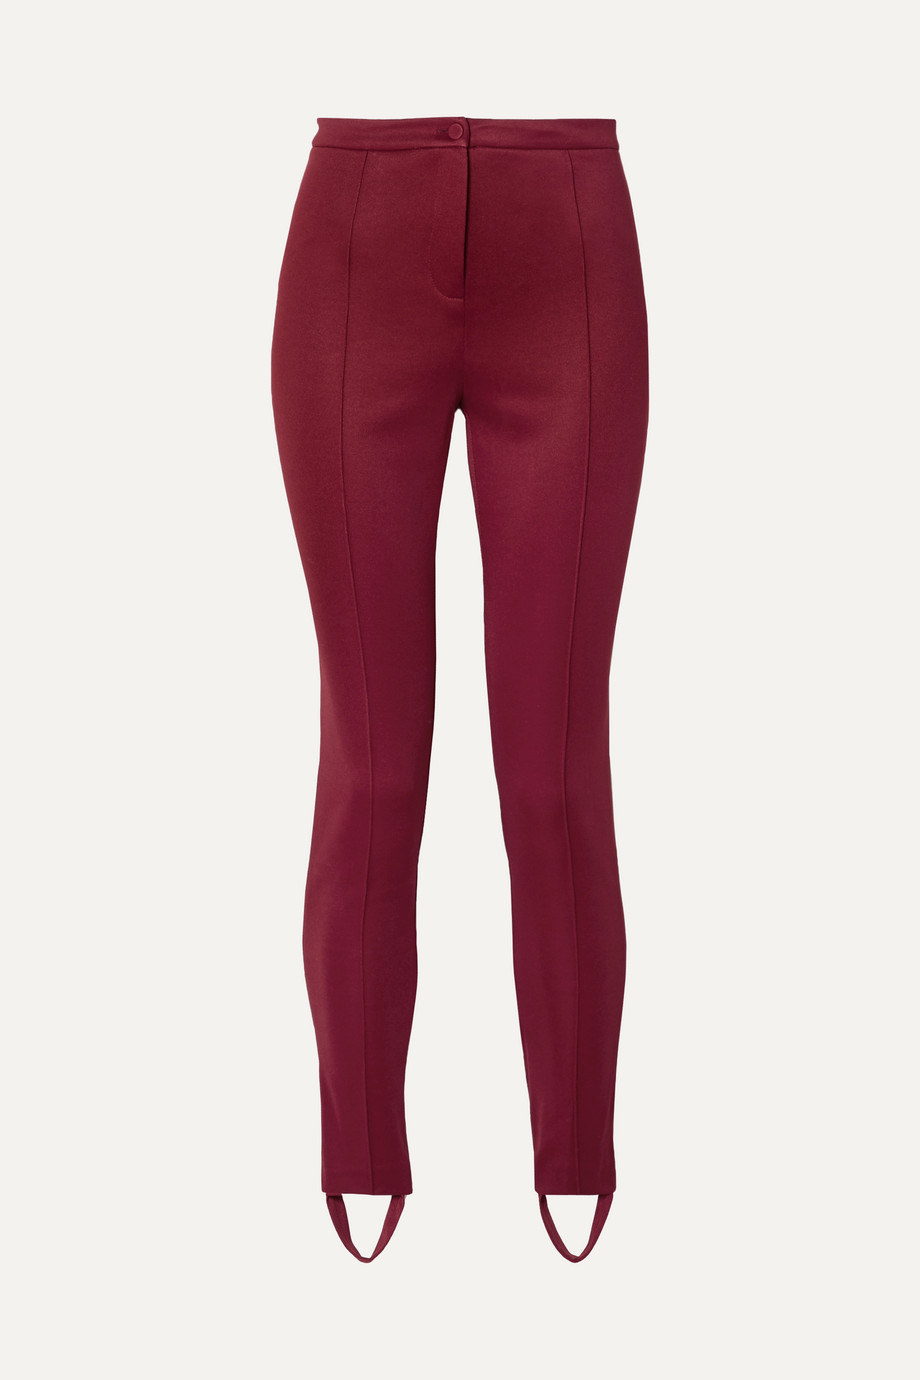 Gucci Tech-jersey stirrup leggings